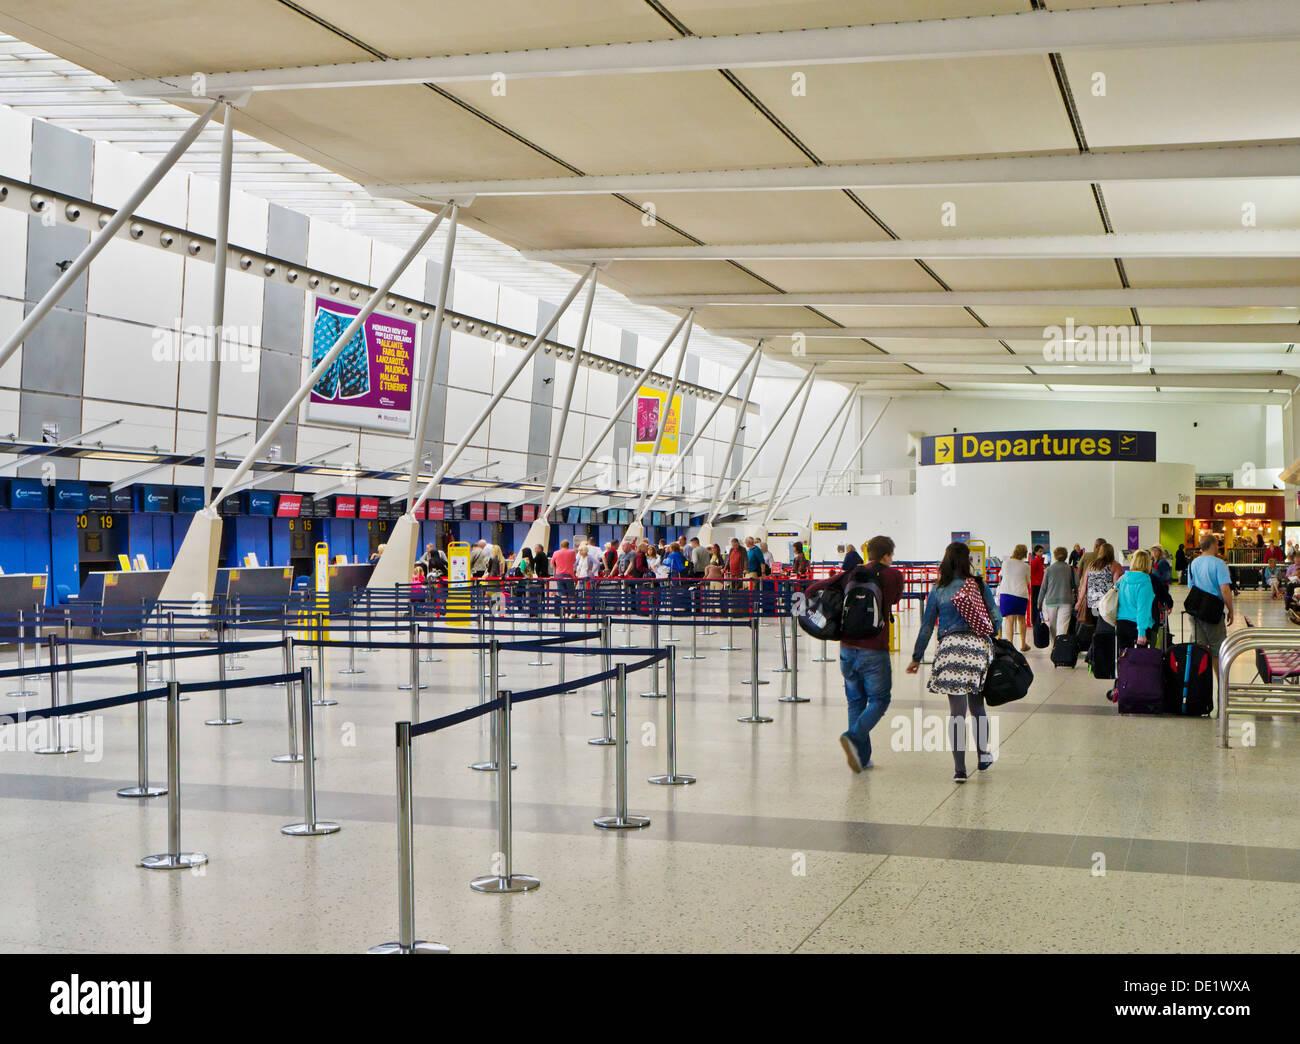 East Midlands airport check in lines to desks area Castle Donnington Derbyshire England UK GB EU Europe - Stock Image